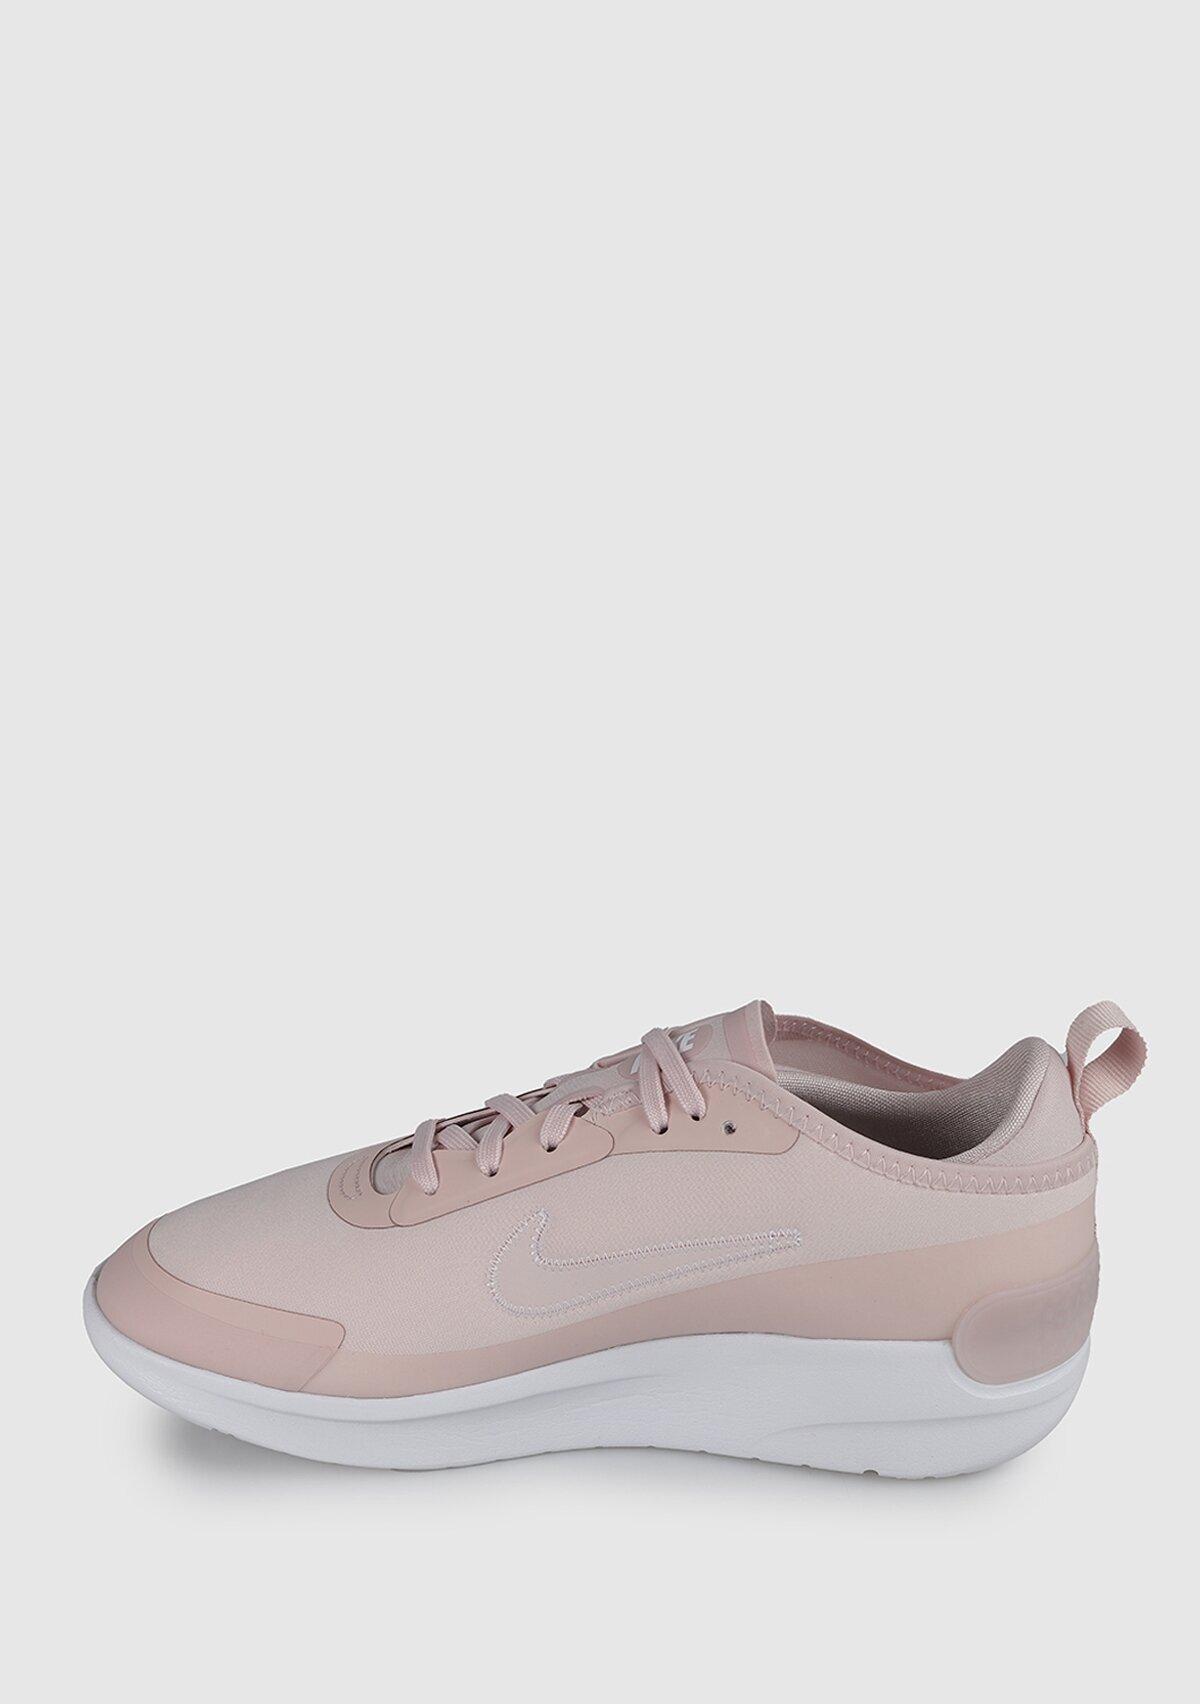 resm Wmns Amixa Pembe Kadın Sneaker Cd5403-600